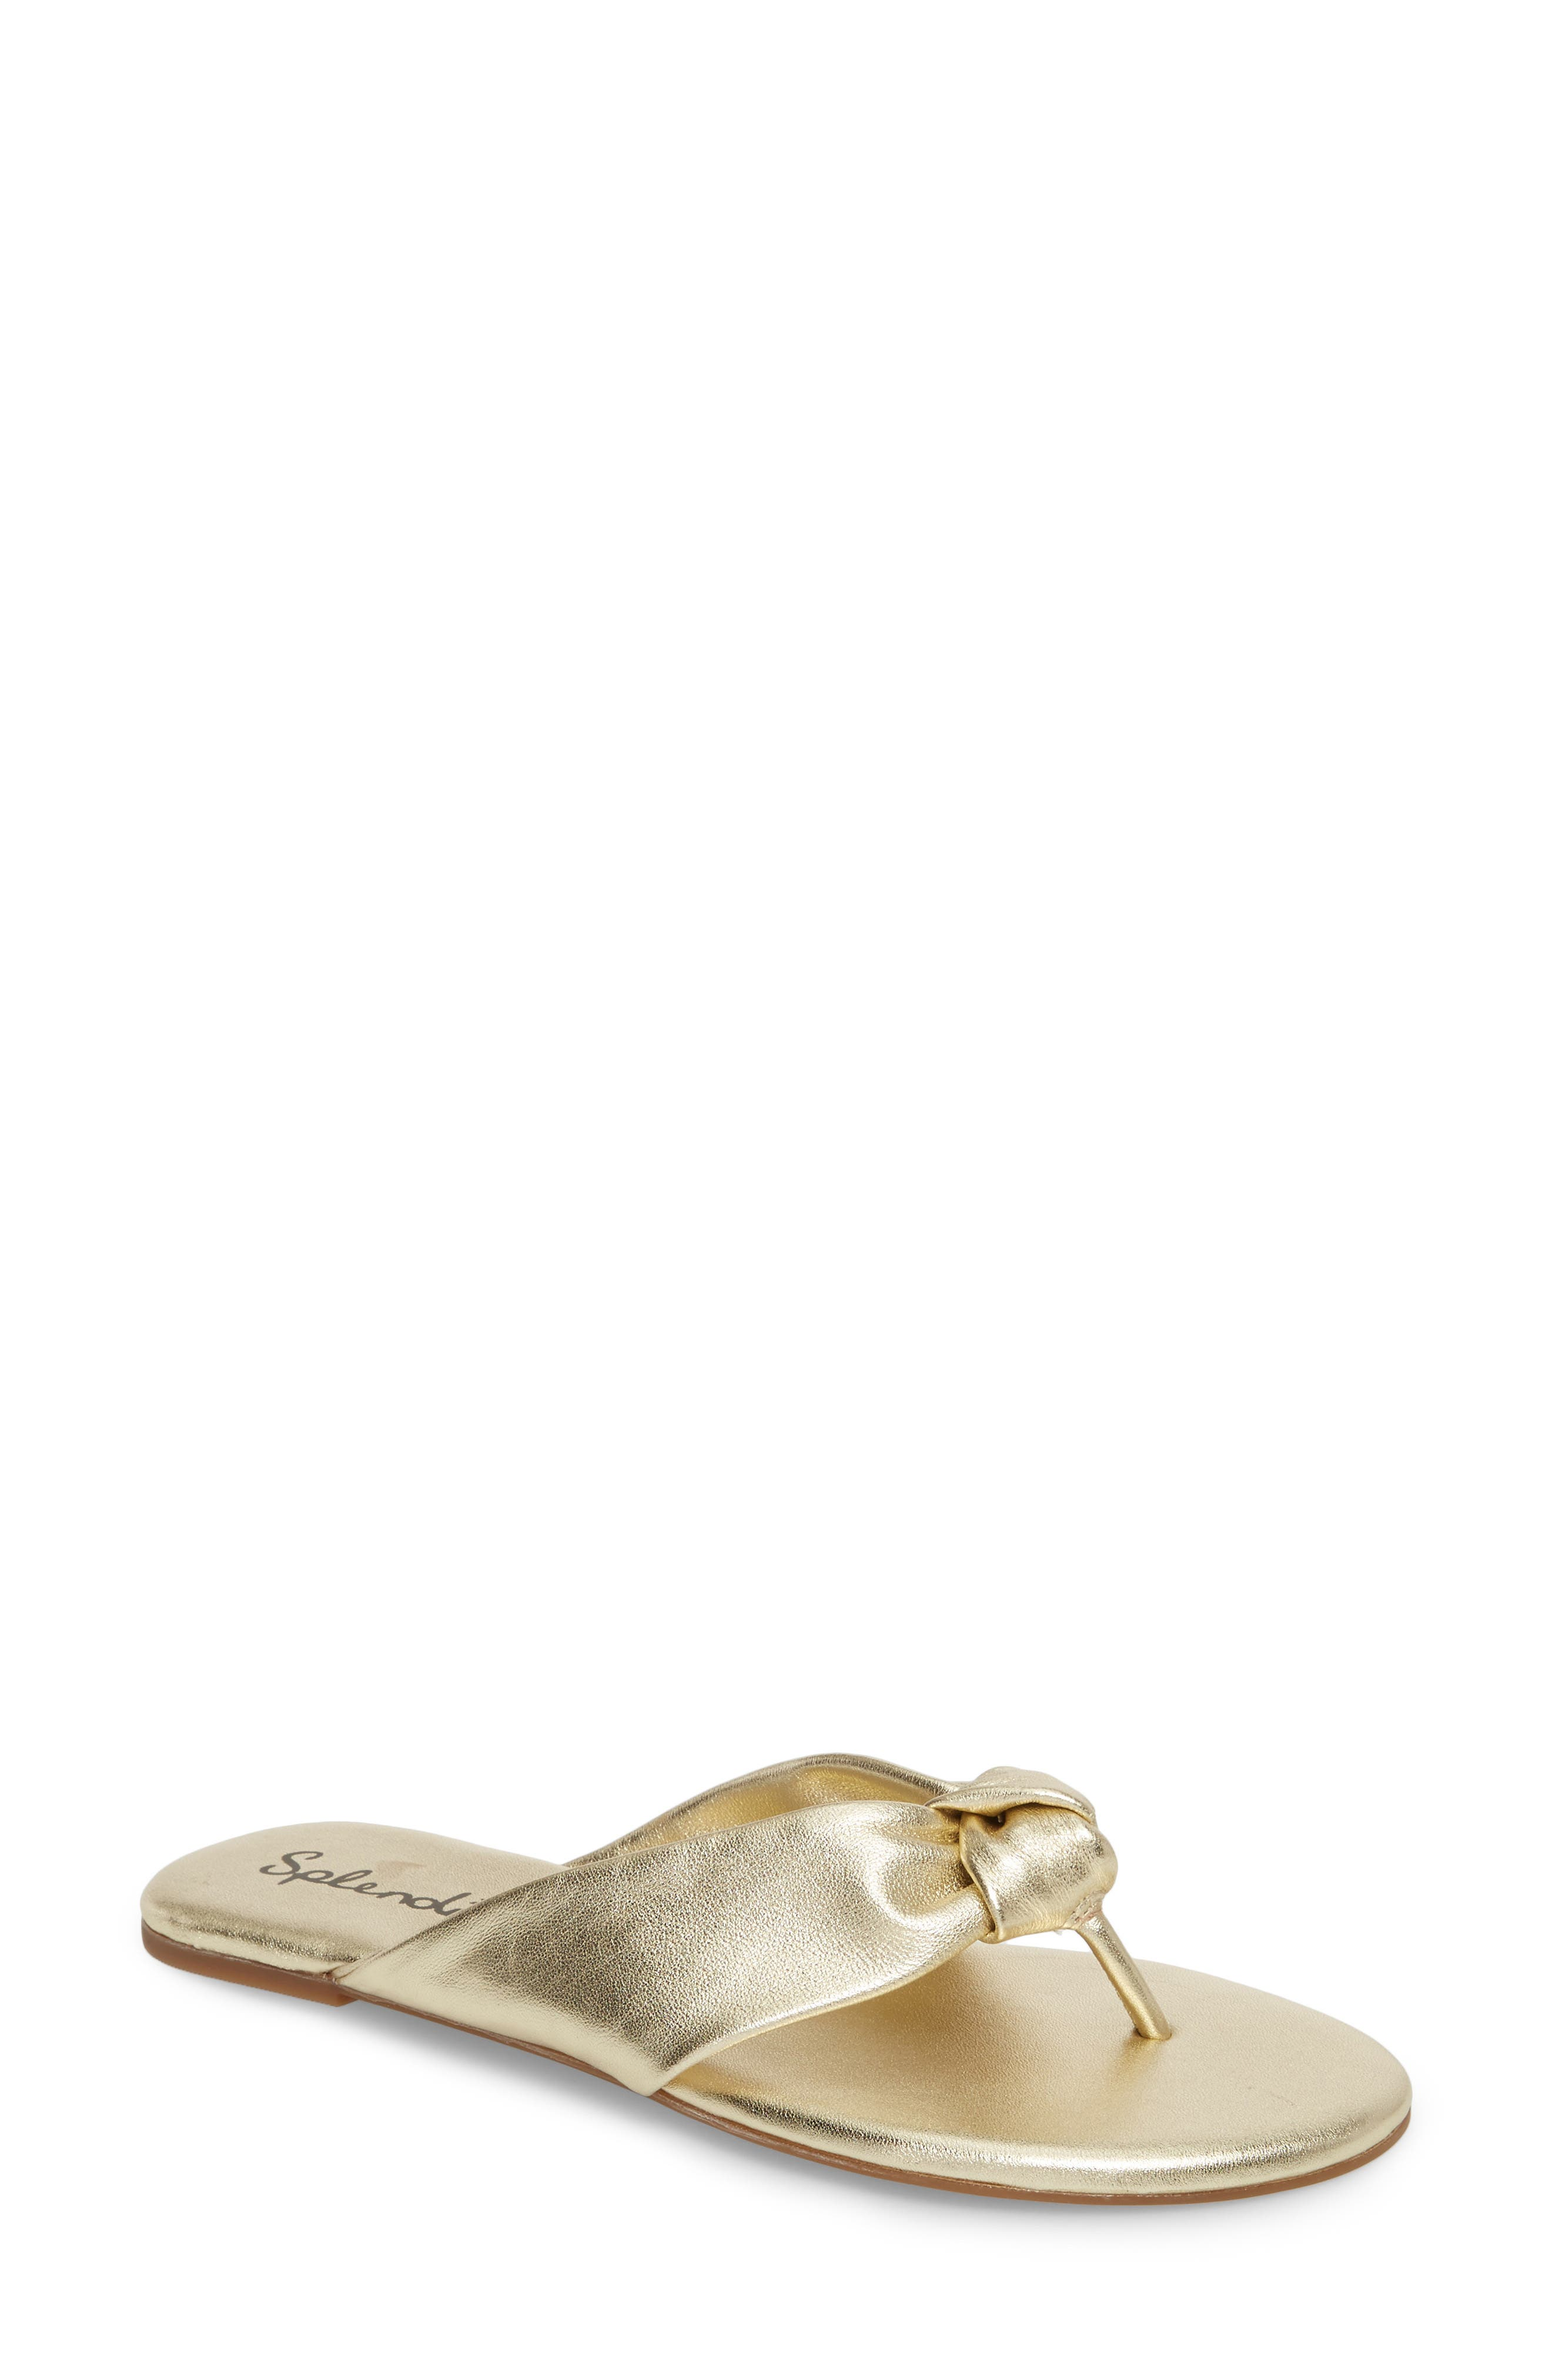 Alternate Image 1 Selected - Splendid Bridgette Knotted Flip Flop (Women)